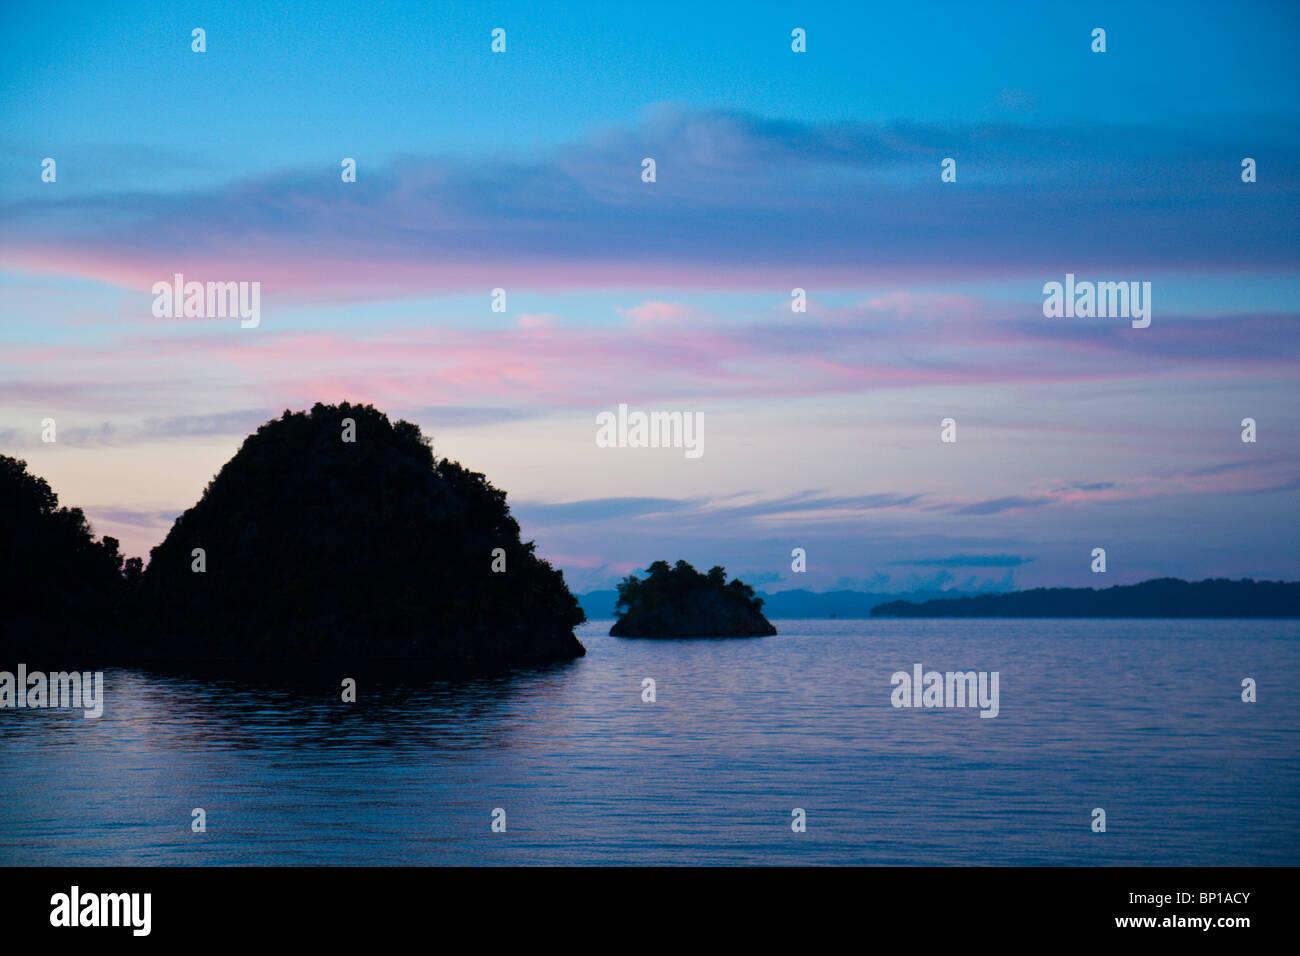 Impressioni di Misool Raja Ampat, Indonesia Immagini Stock